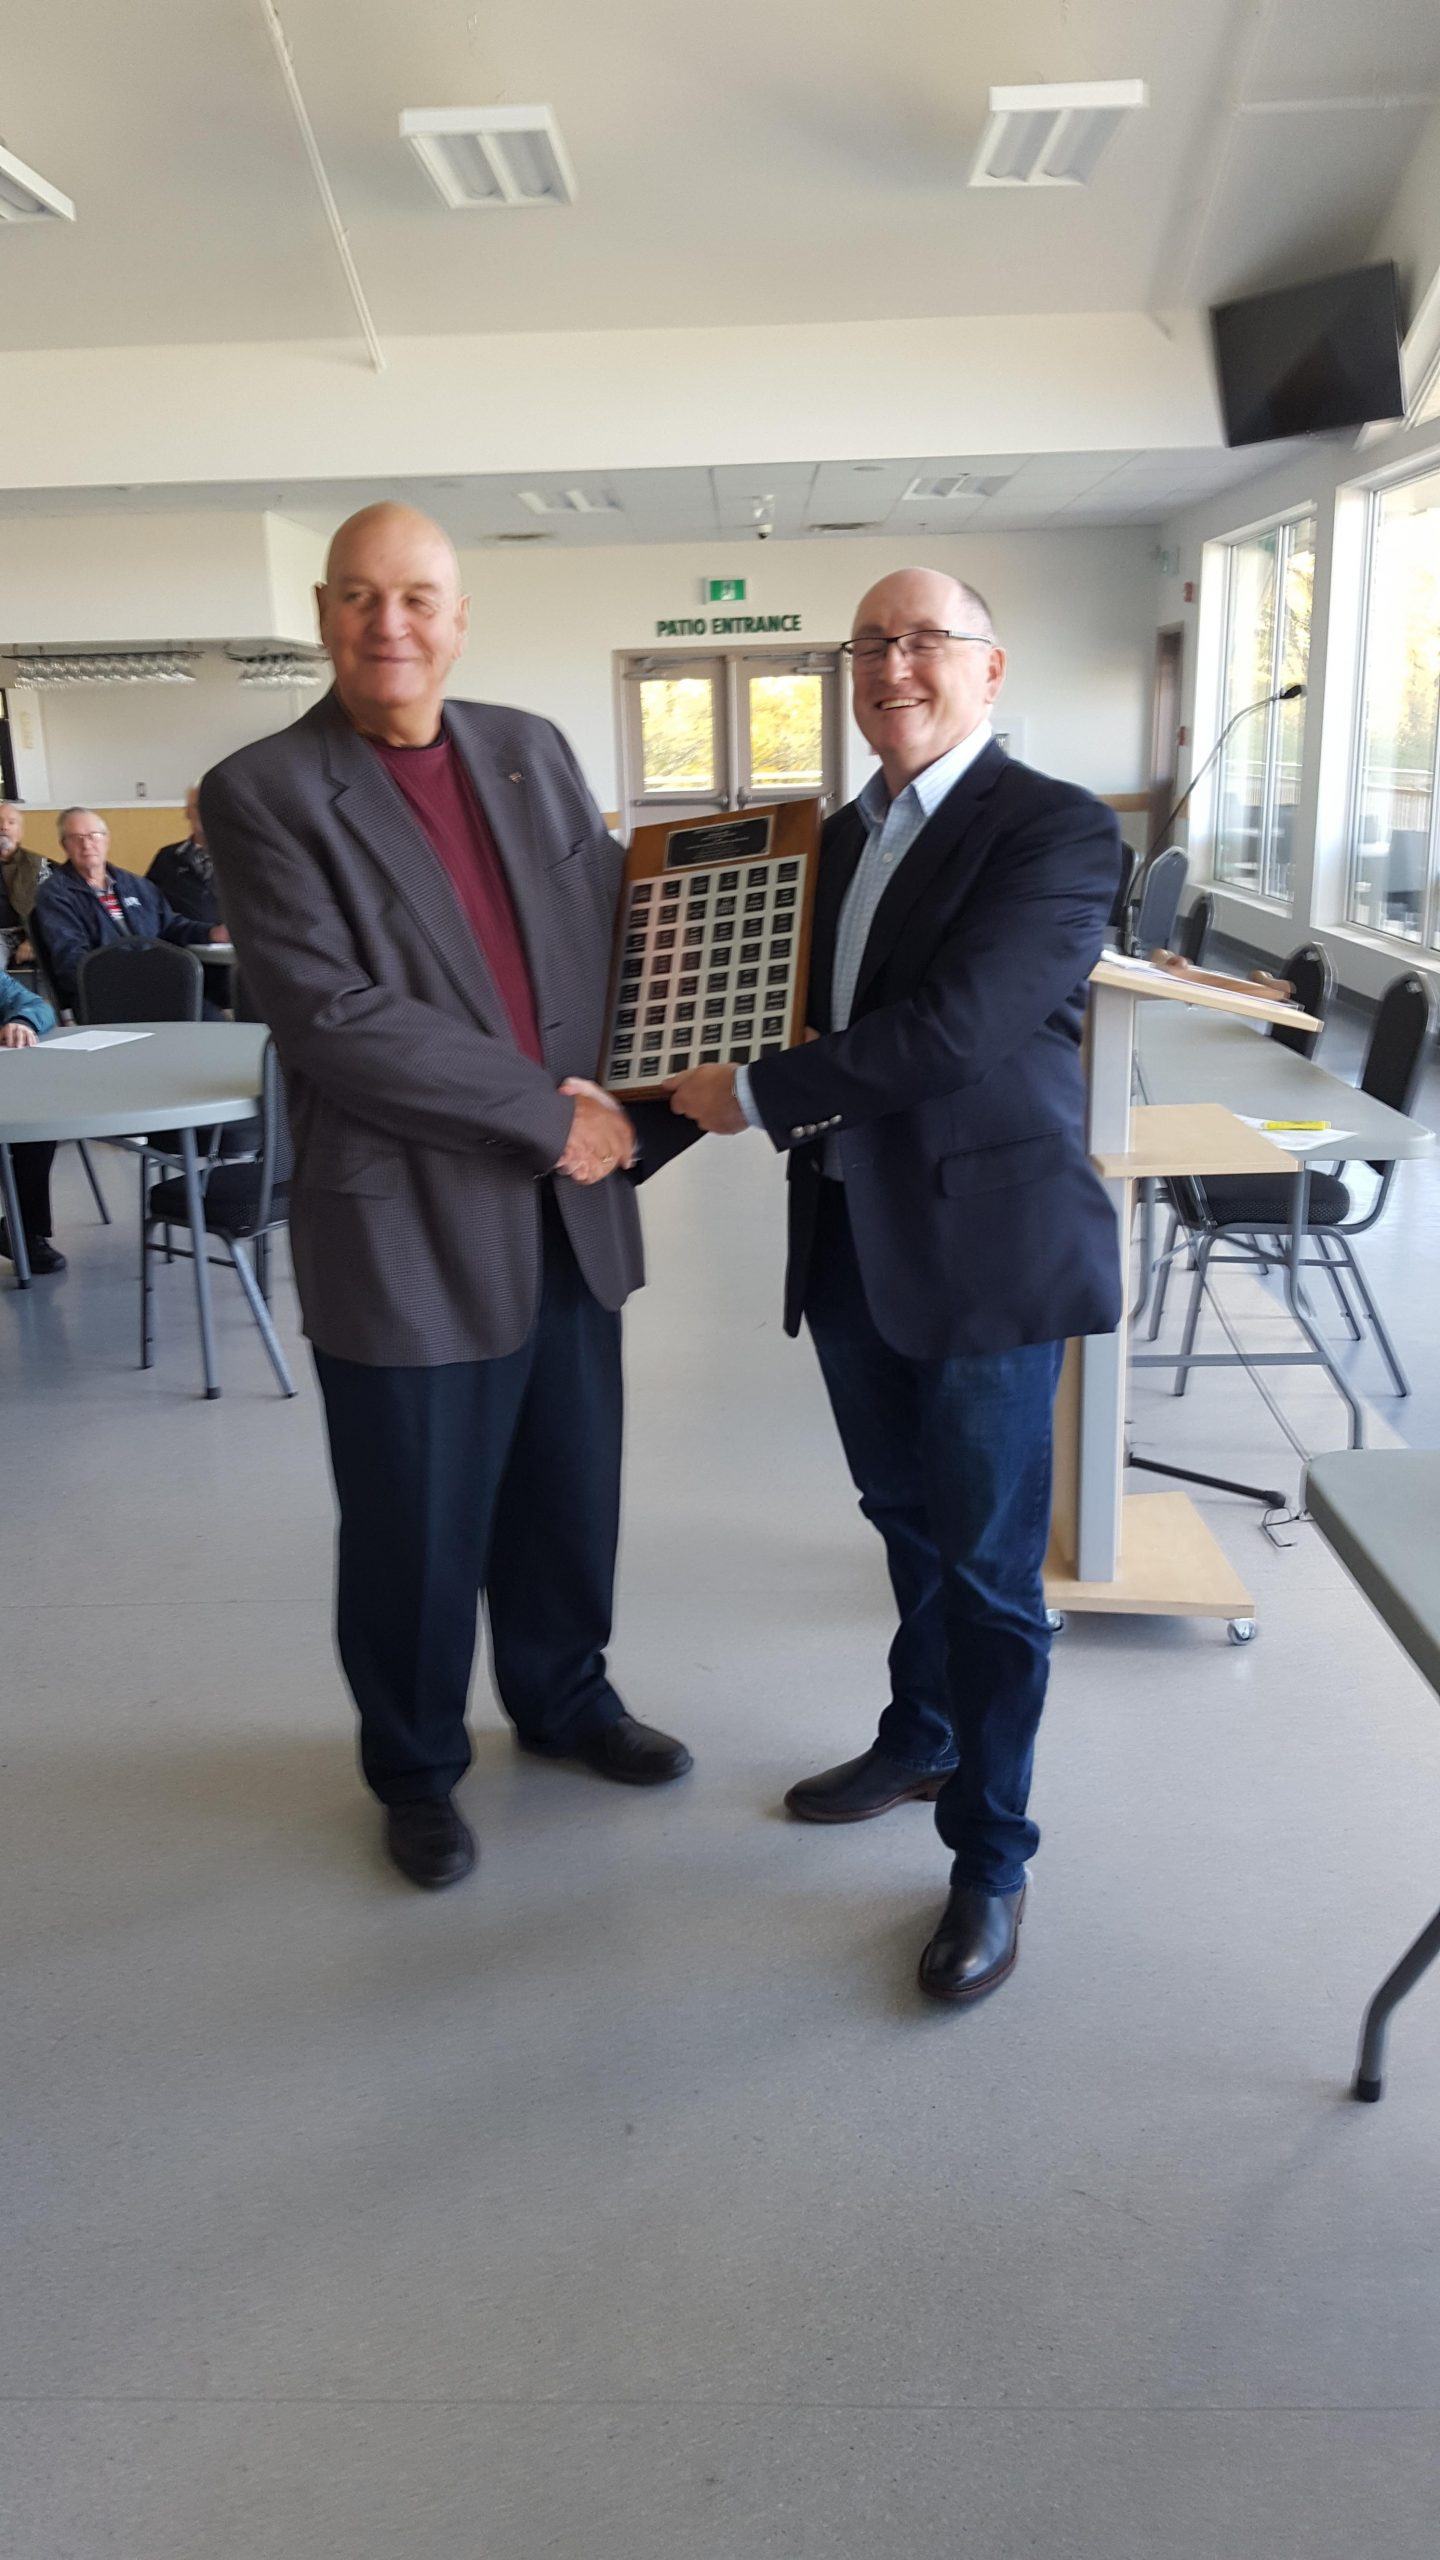 Shalovelo Receives 44th Darren Lipinski Memorial Award